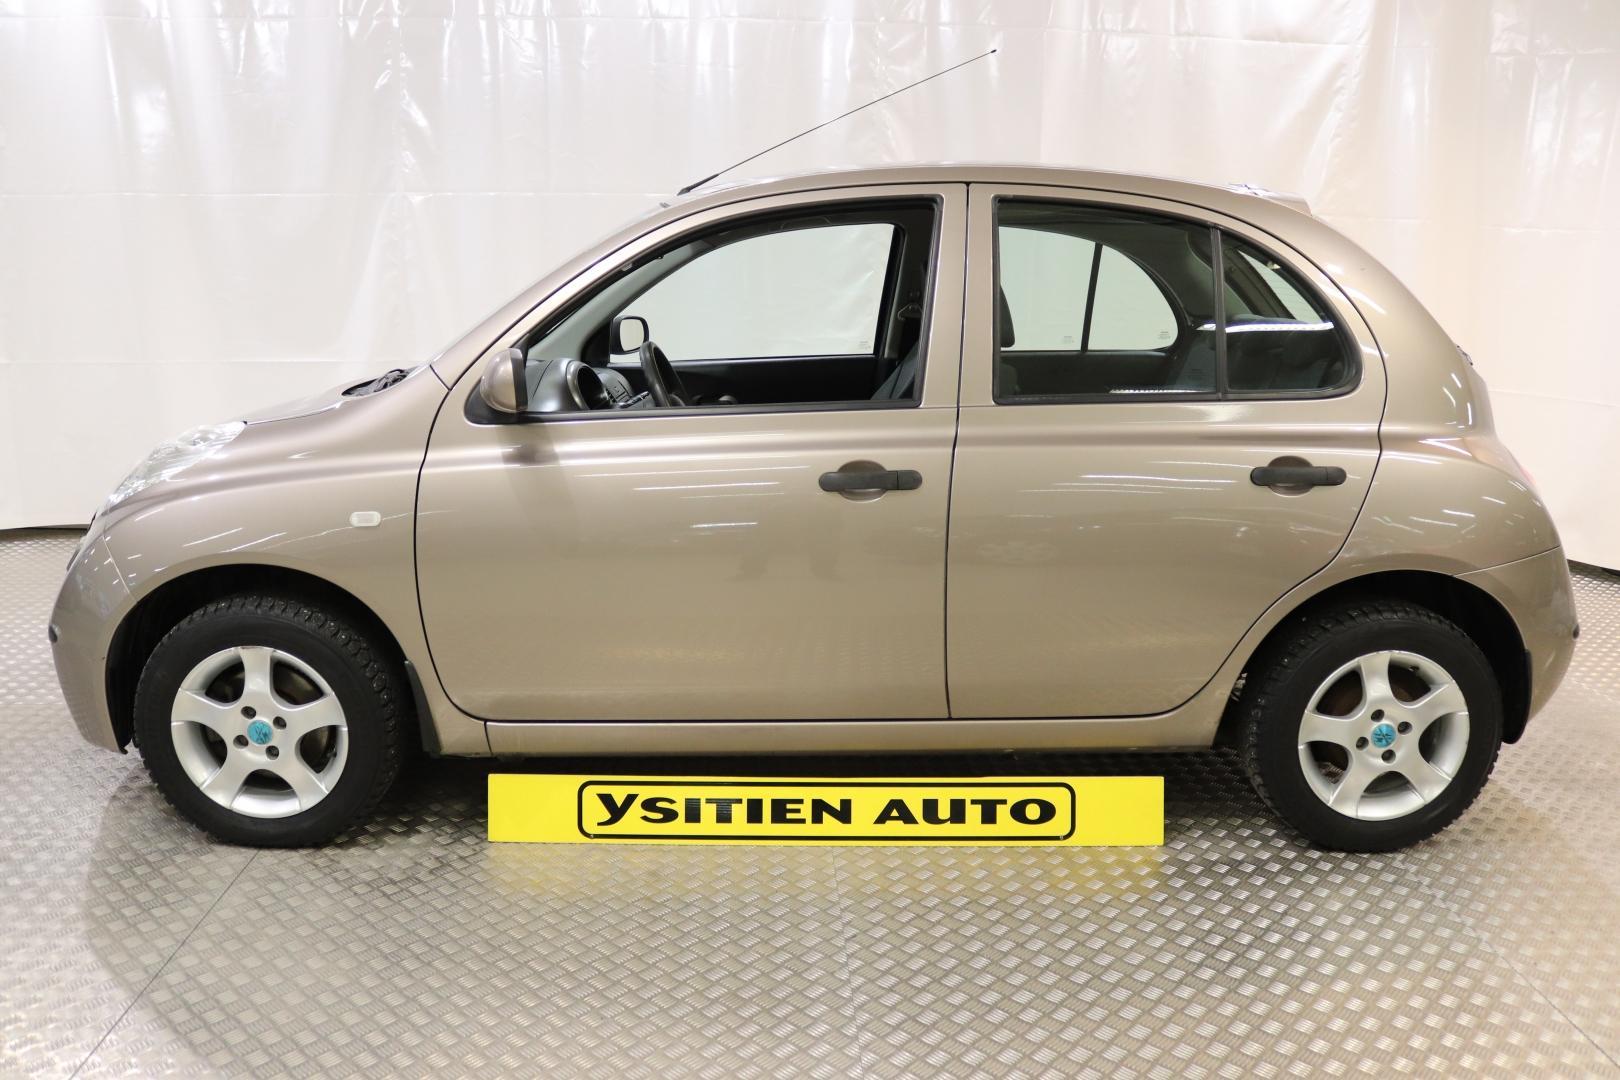 Nissan Micra, 1.2 65 Visia 5d